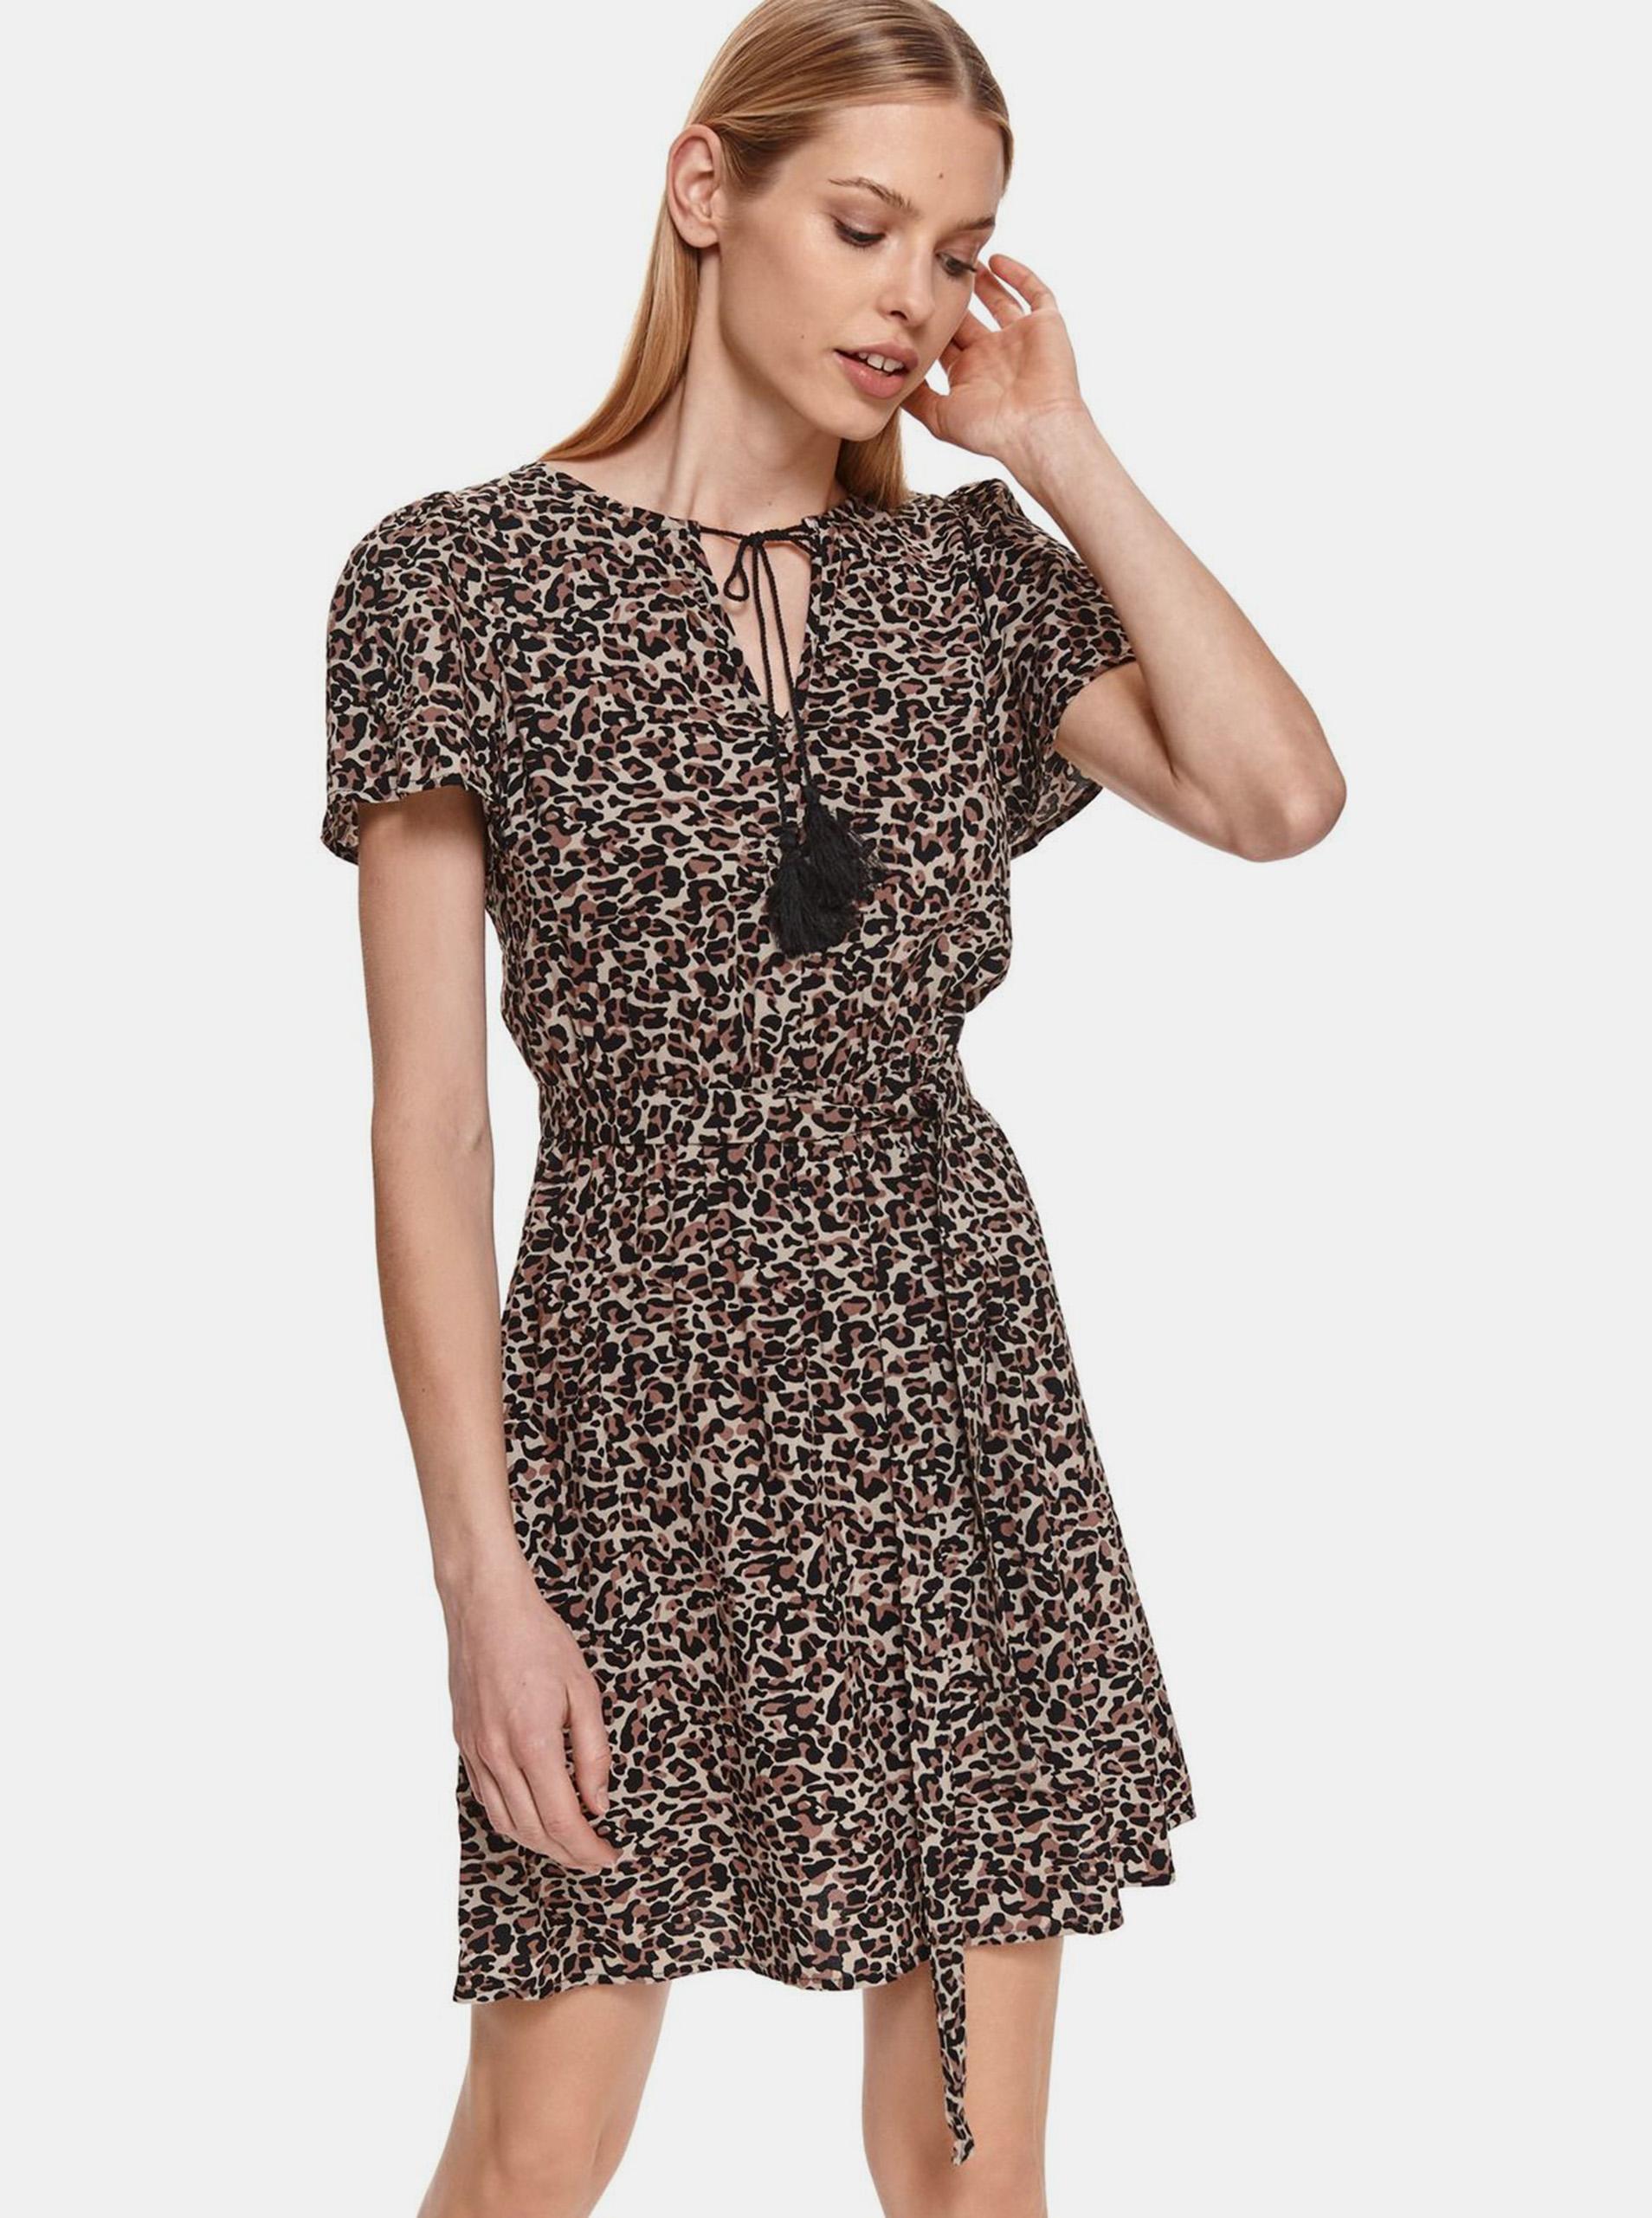 TOP SECRET brown dress